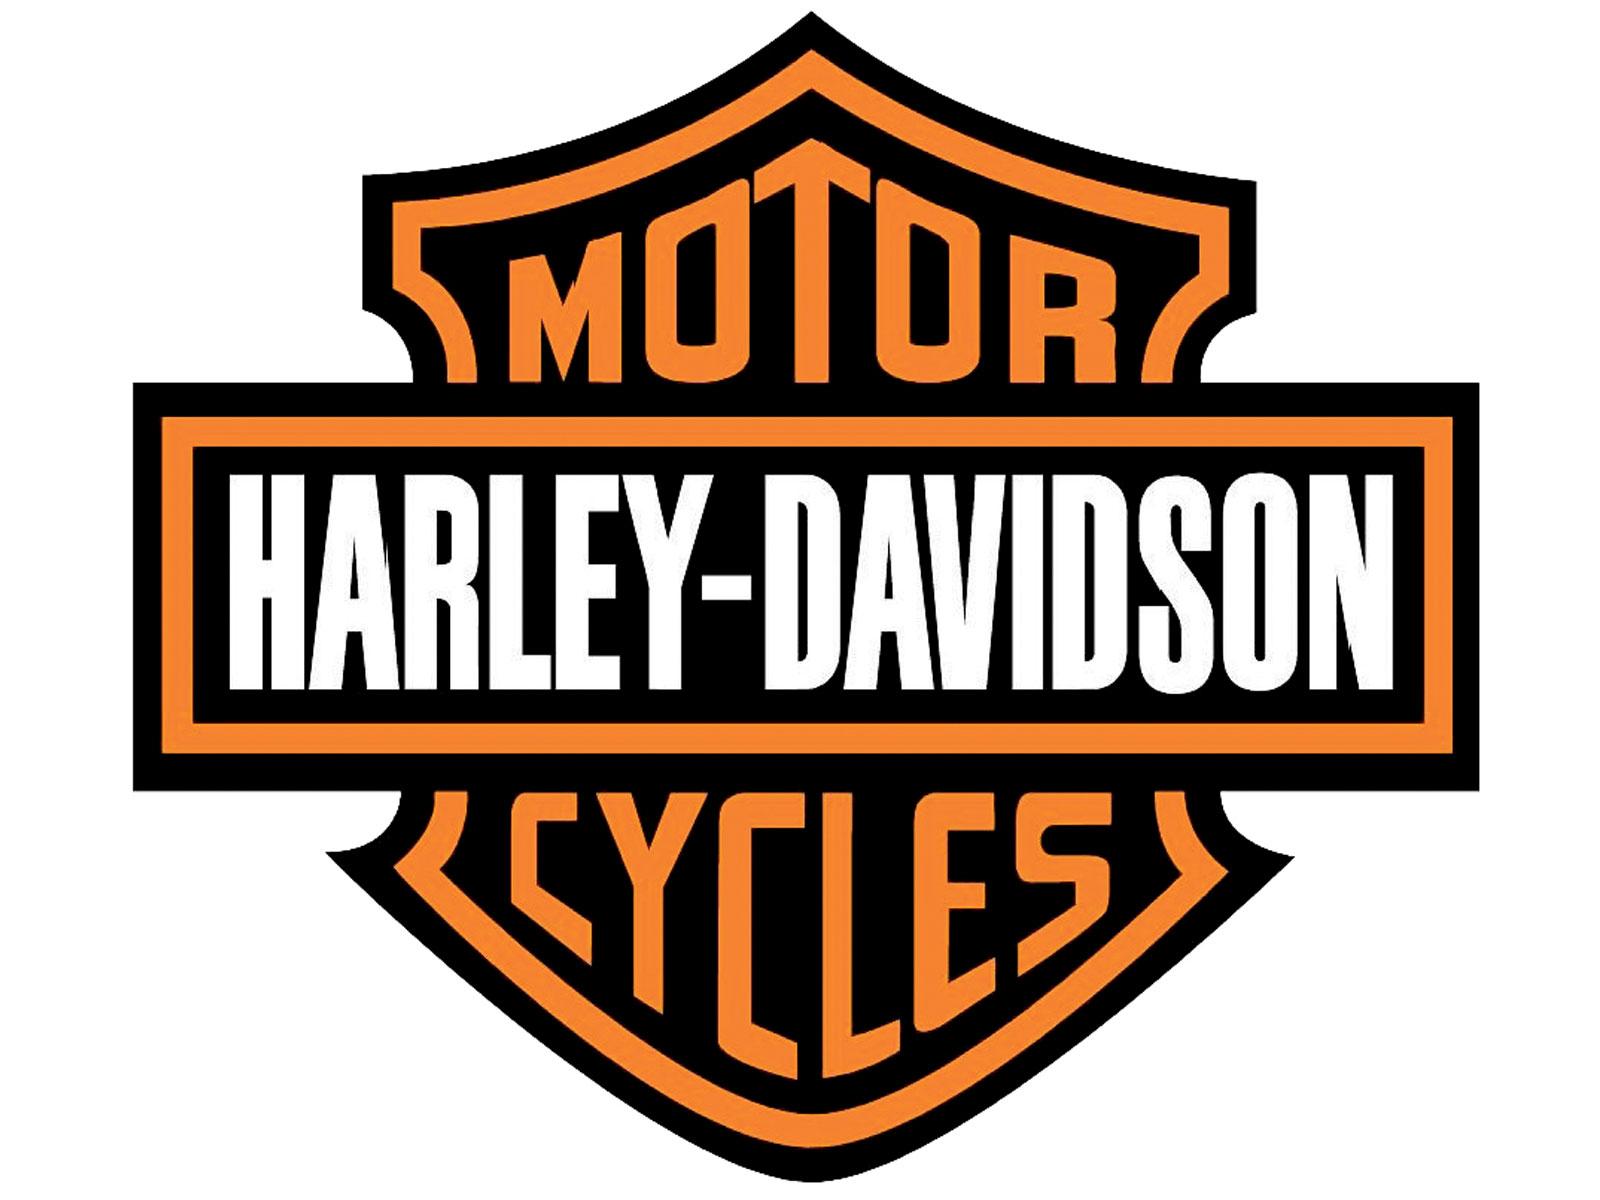 Harley Davidson clipart famous Black clipart logo orange